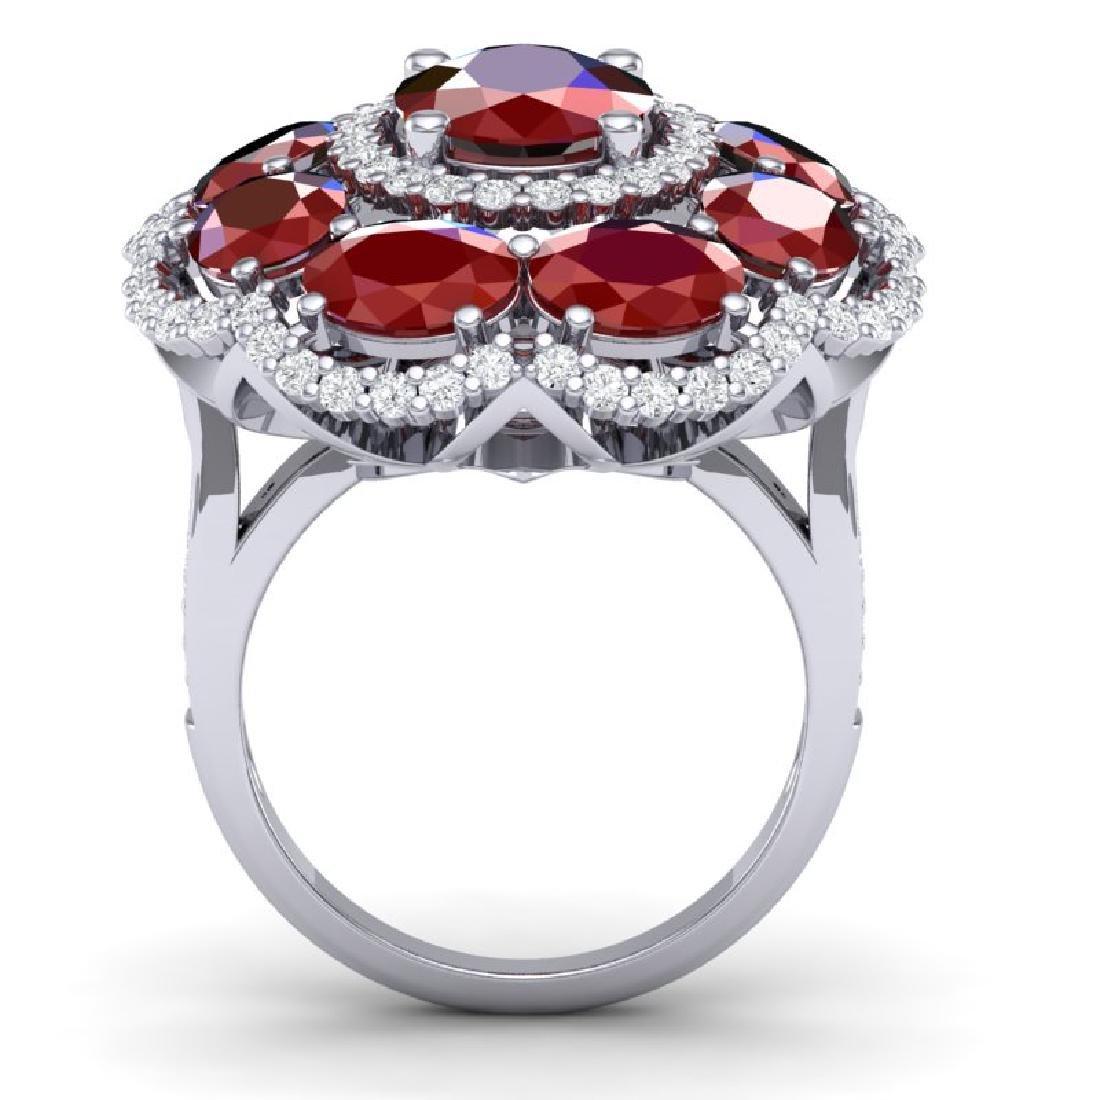 14.4 CTW Royalty Designer Ruby & VS Diamond Ring 18K - 3